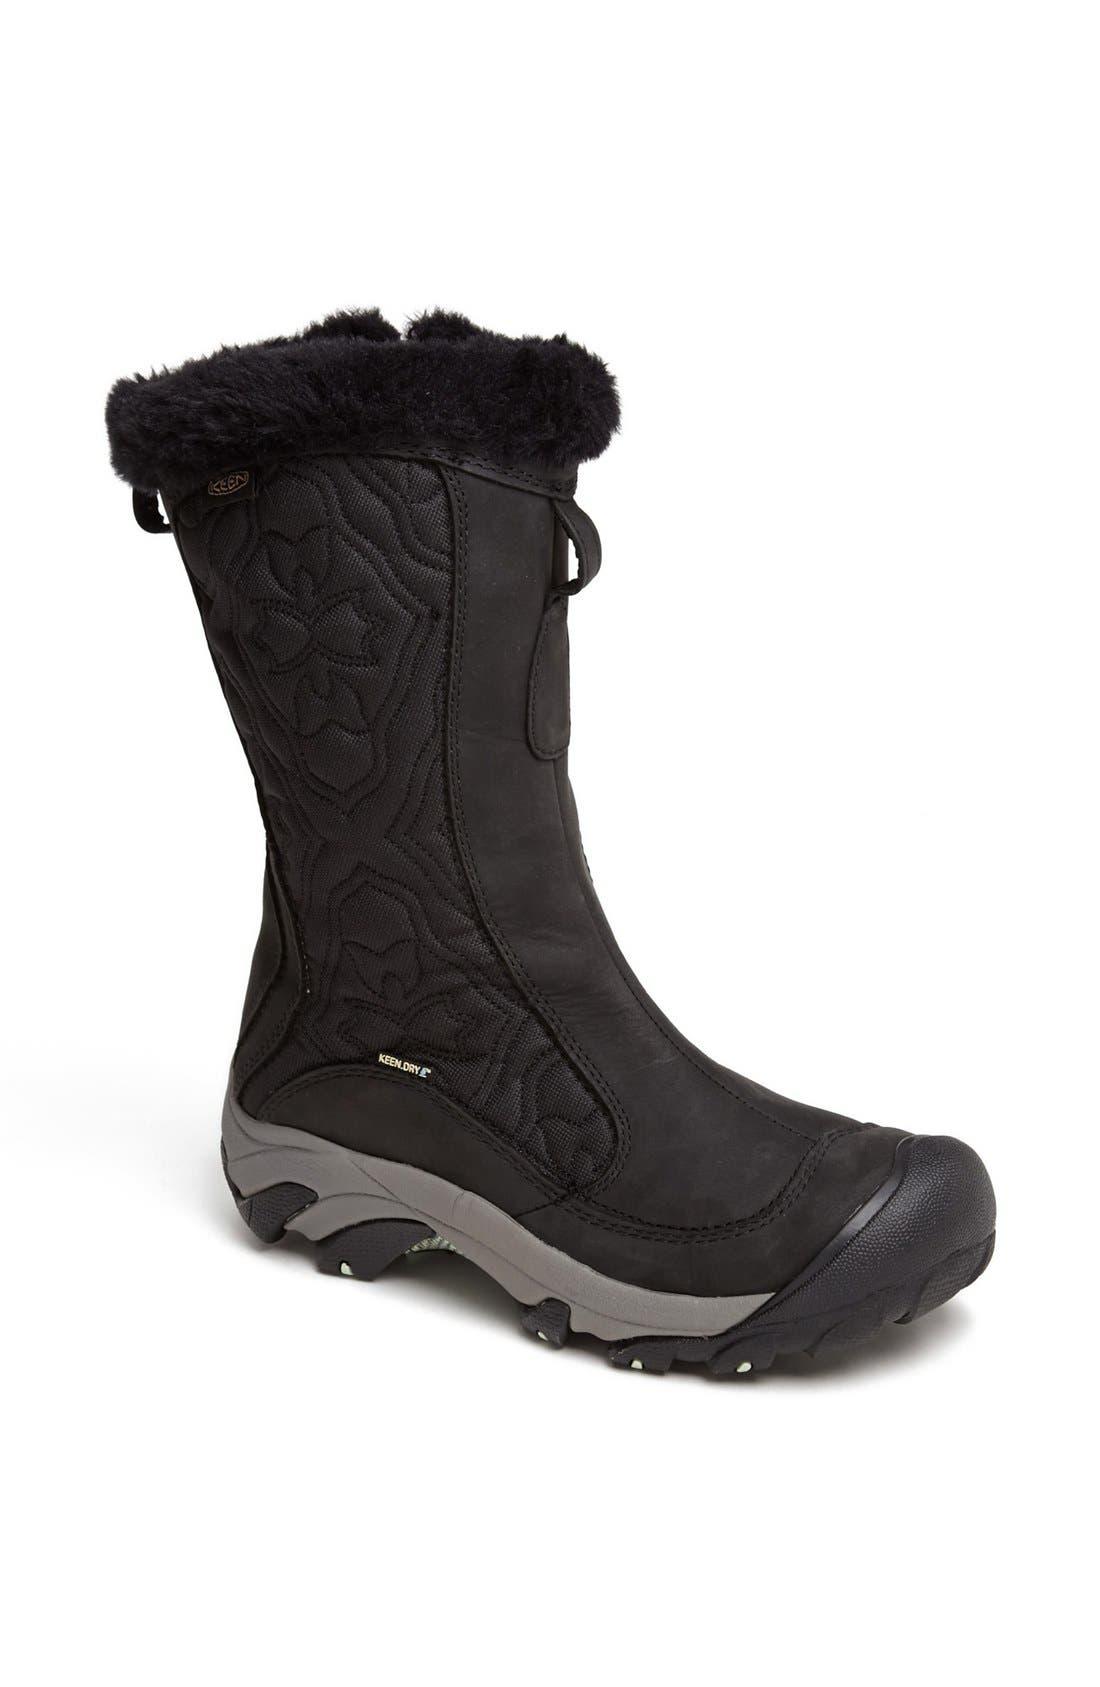 Main Image - Keen 'Betty II' Waterproof Snow Boot